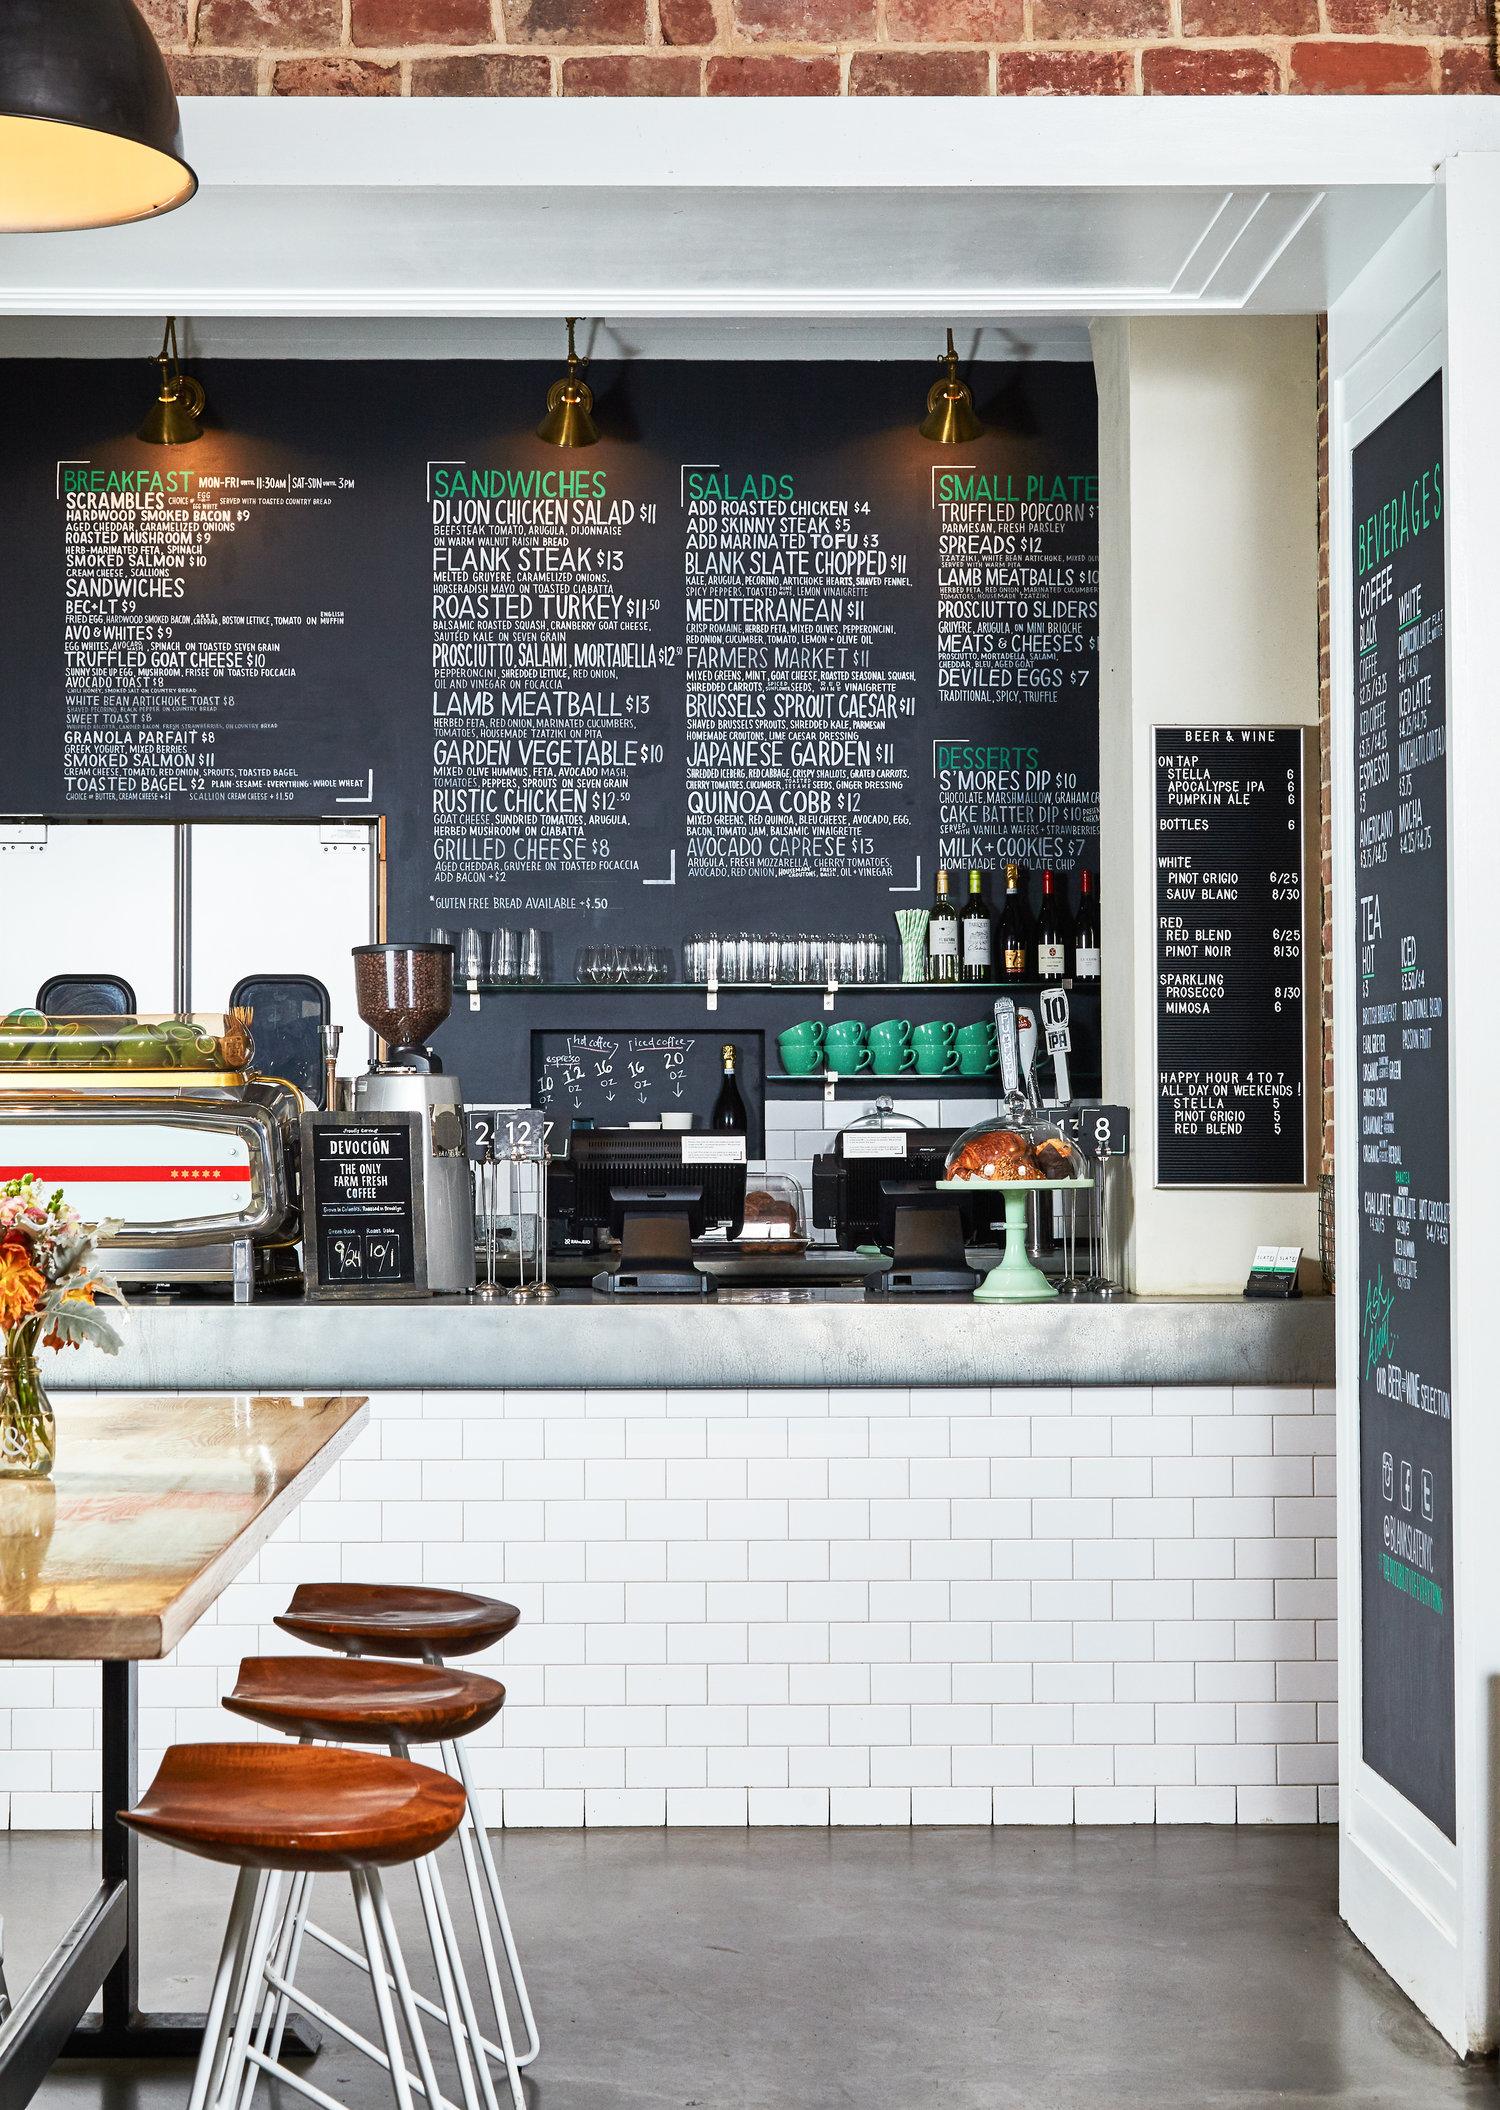 about standalone — blank slate | coffee + kitchen